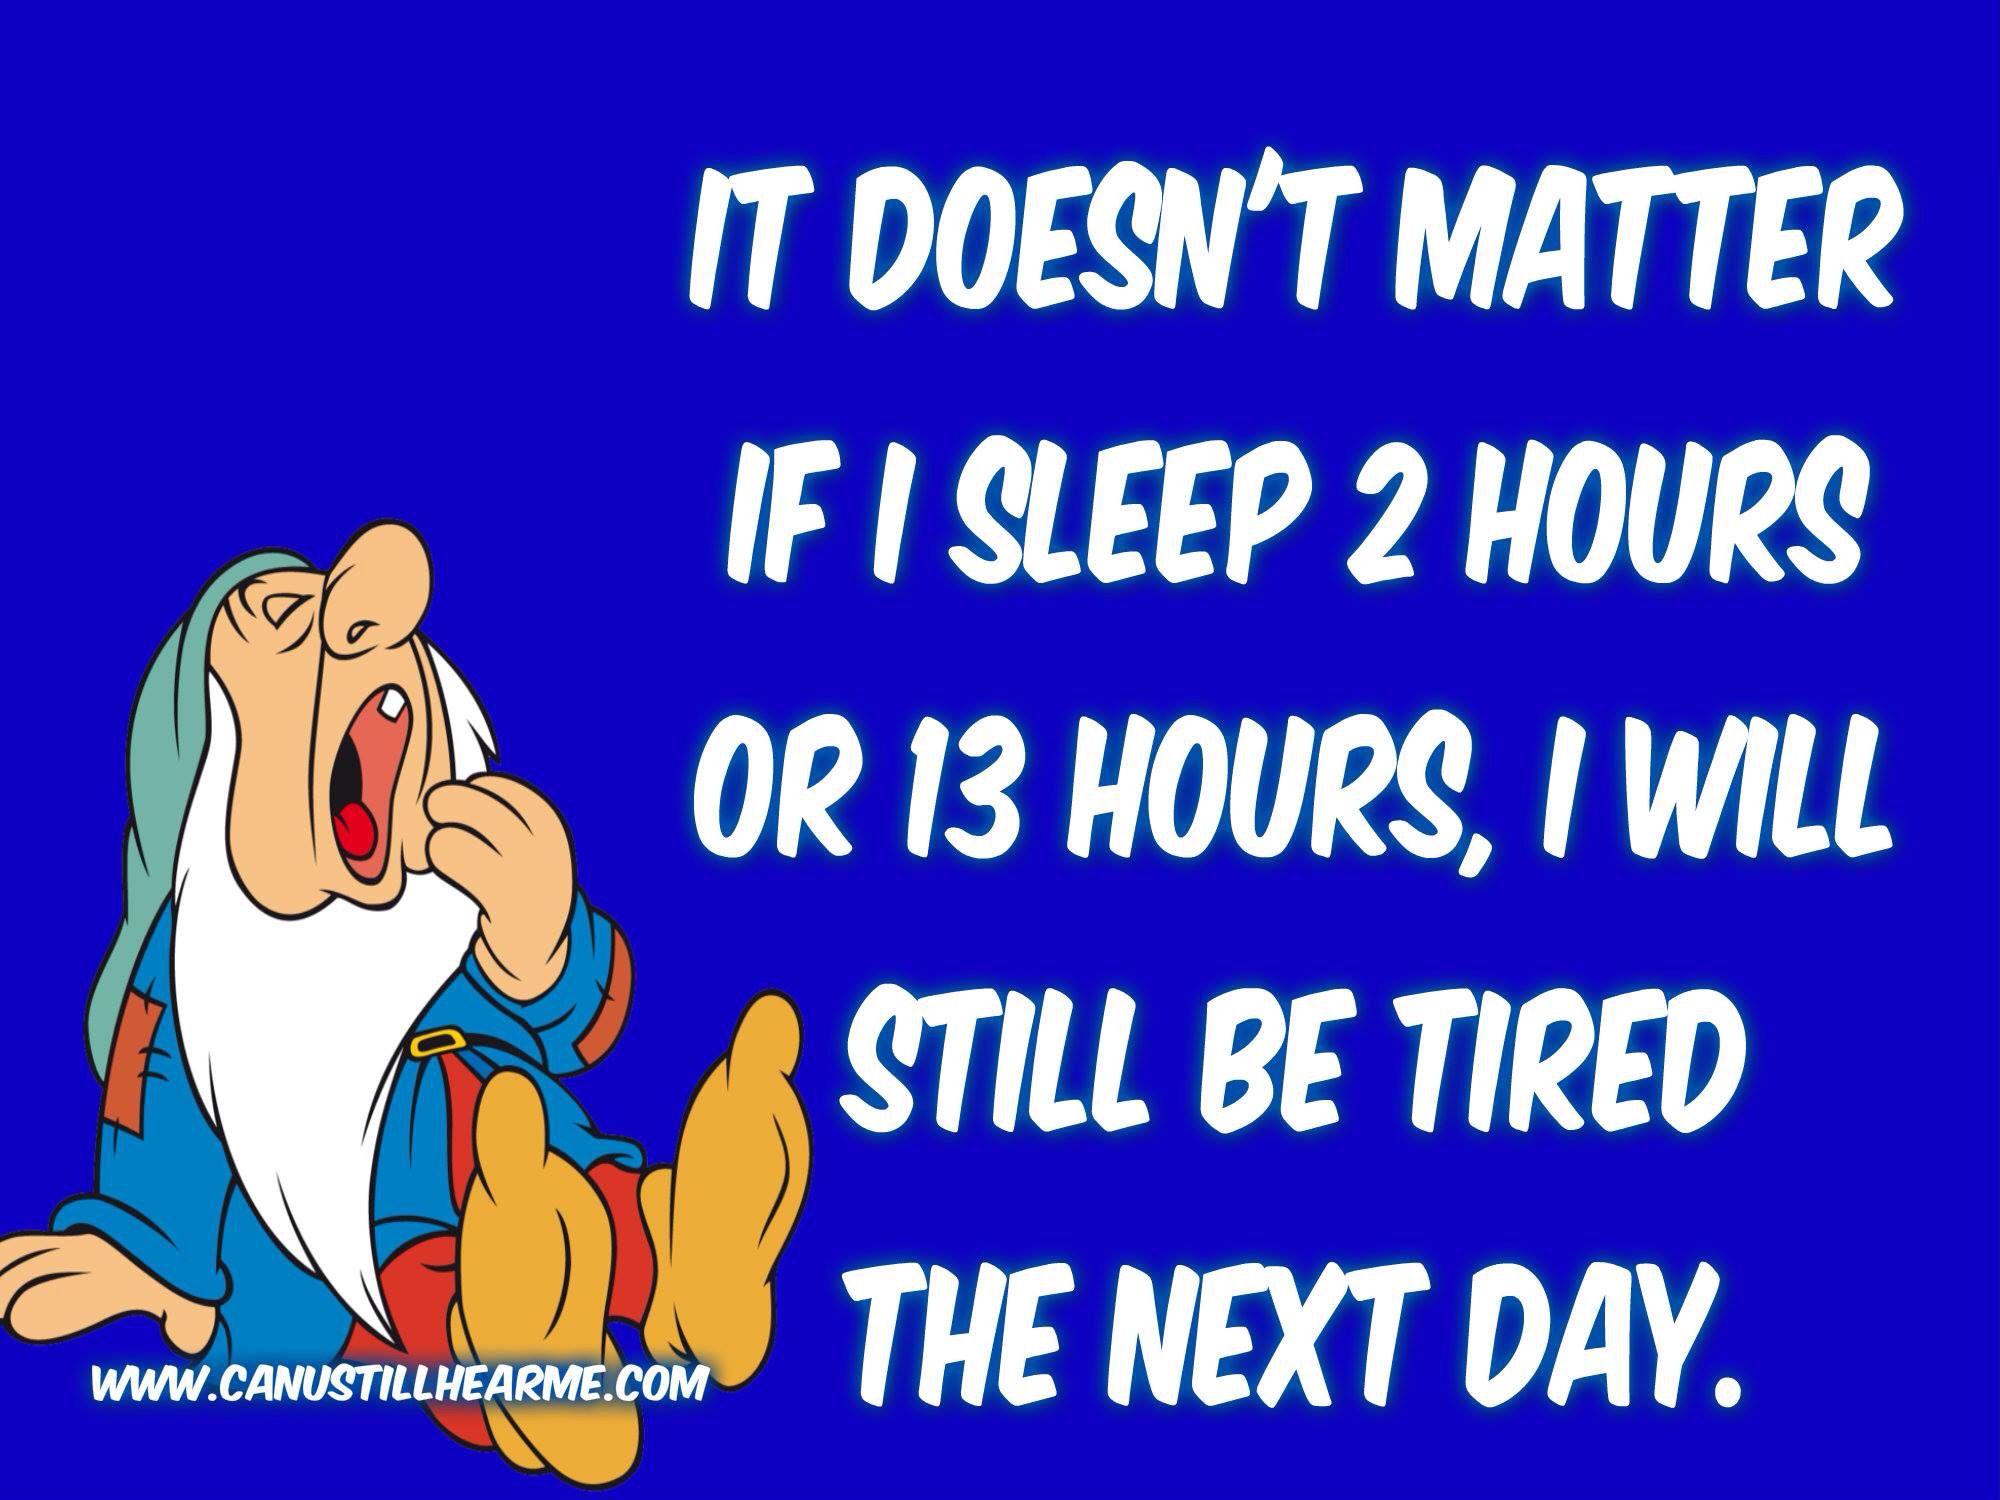 I am always tired, Ha!